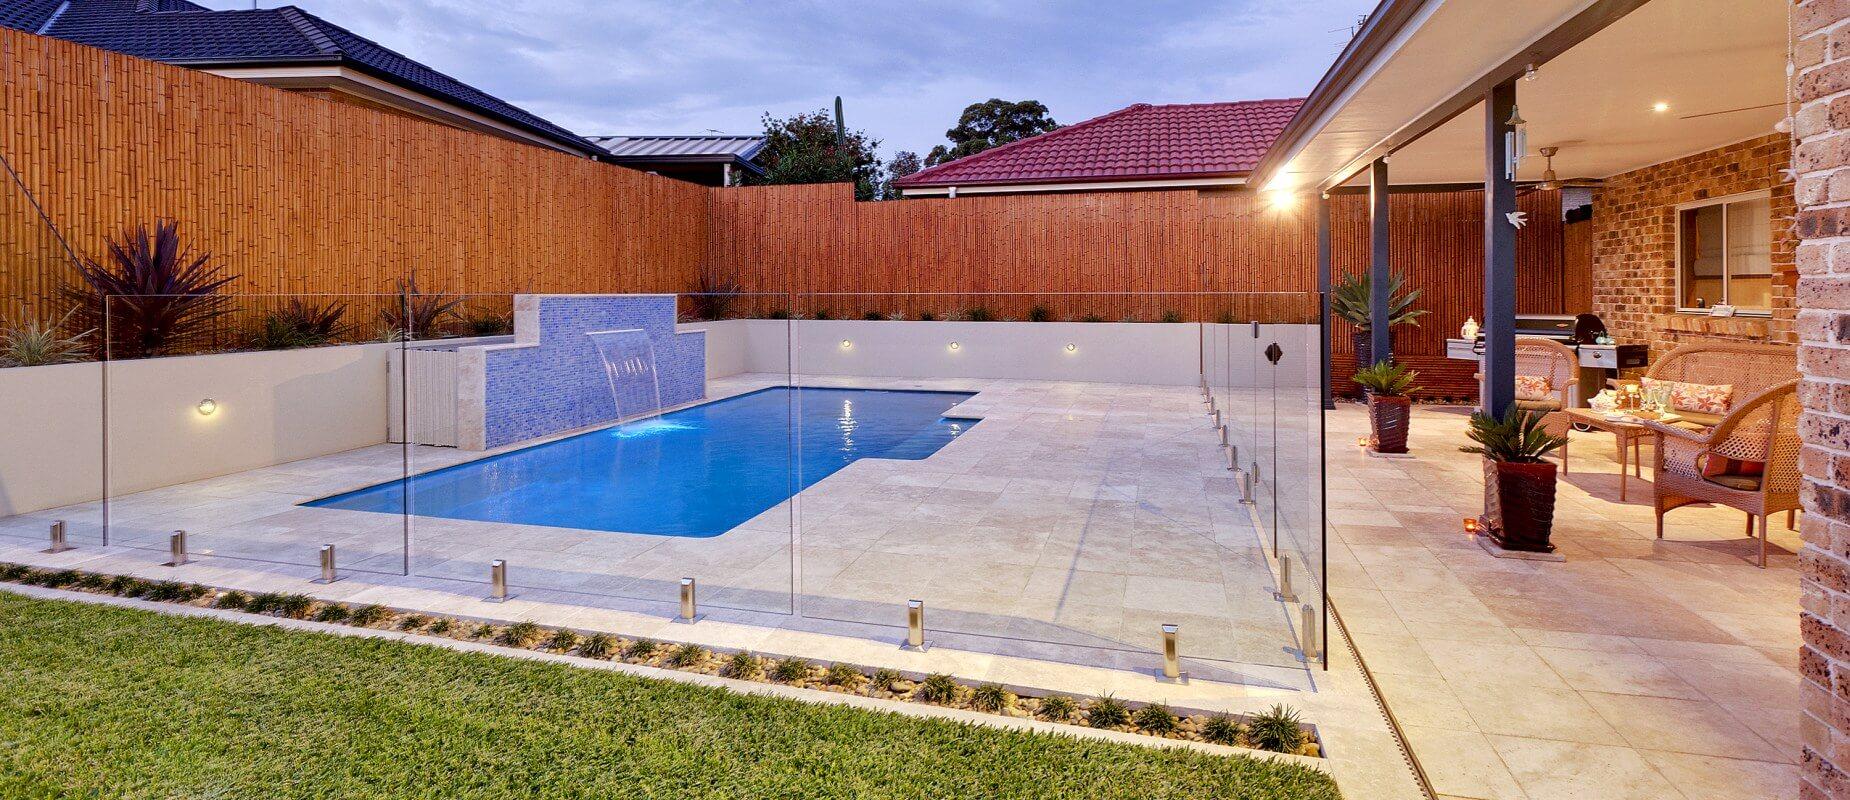 piscina de lux modele frumoase 27